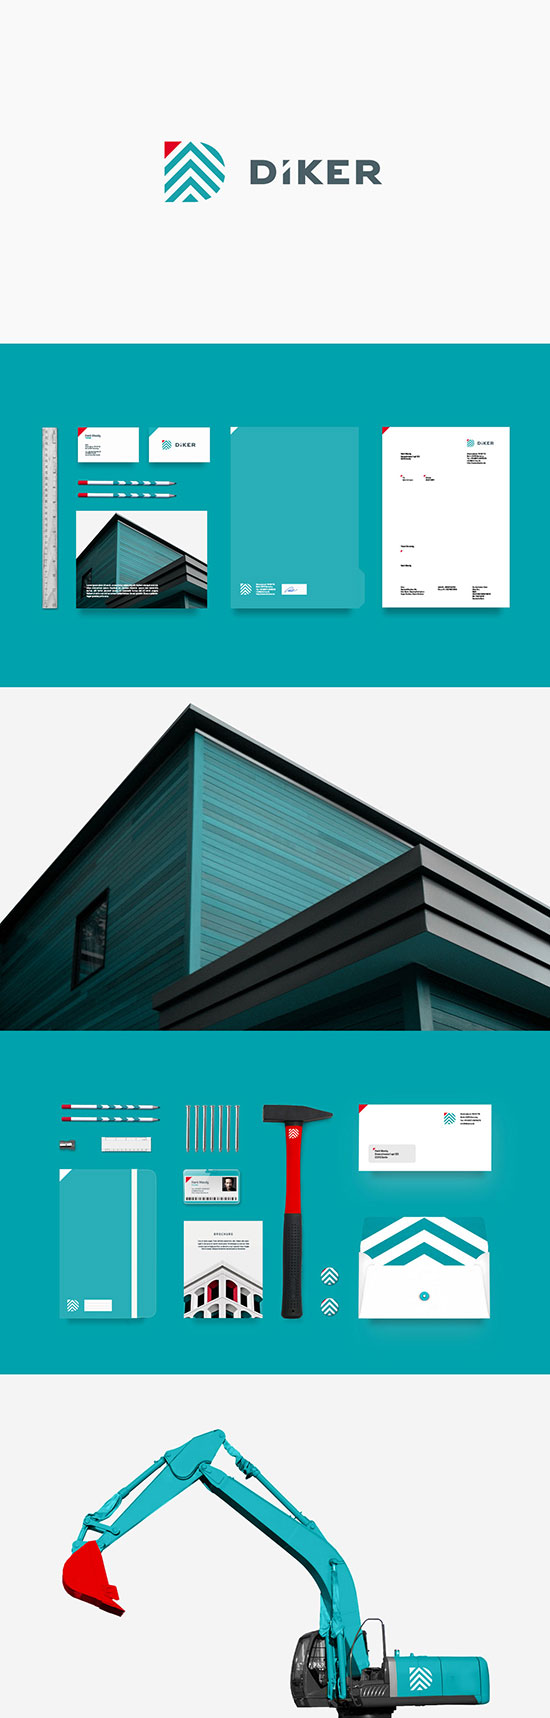 Diker Bau by Ramin Nasibov